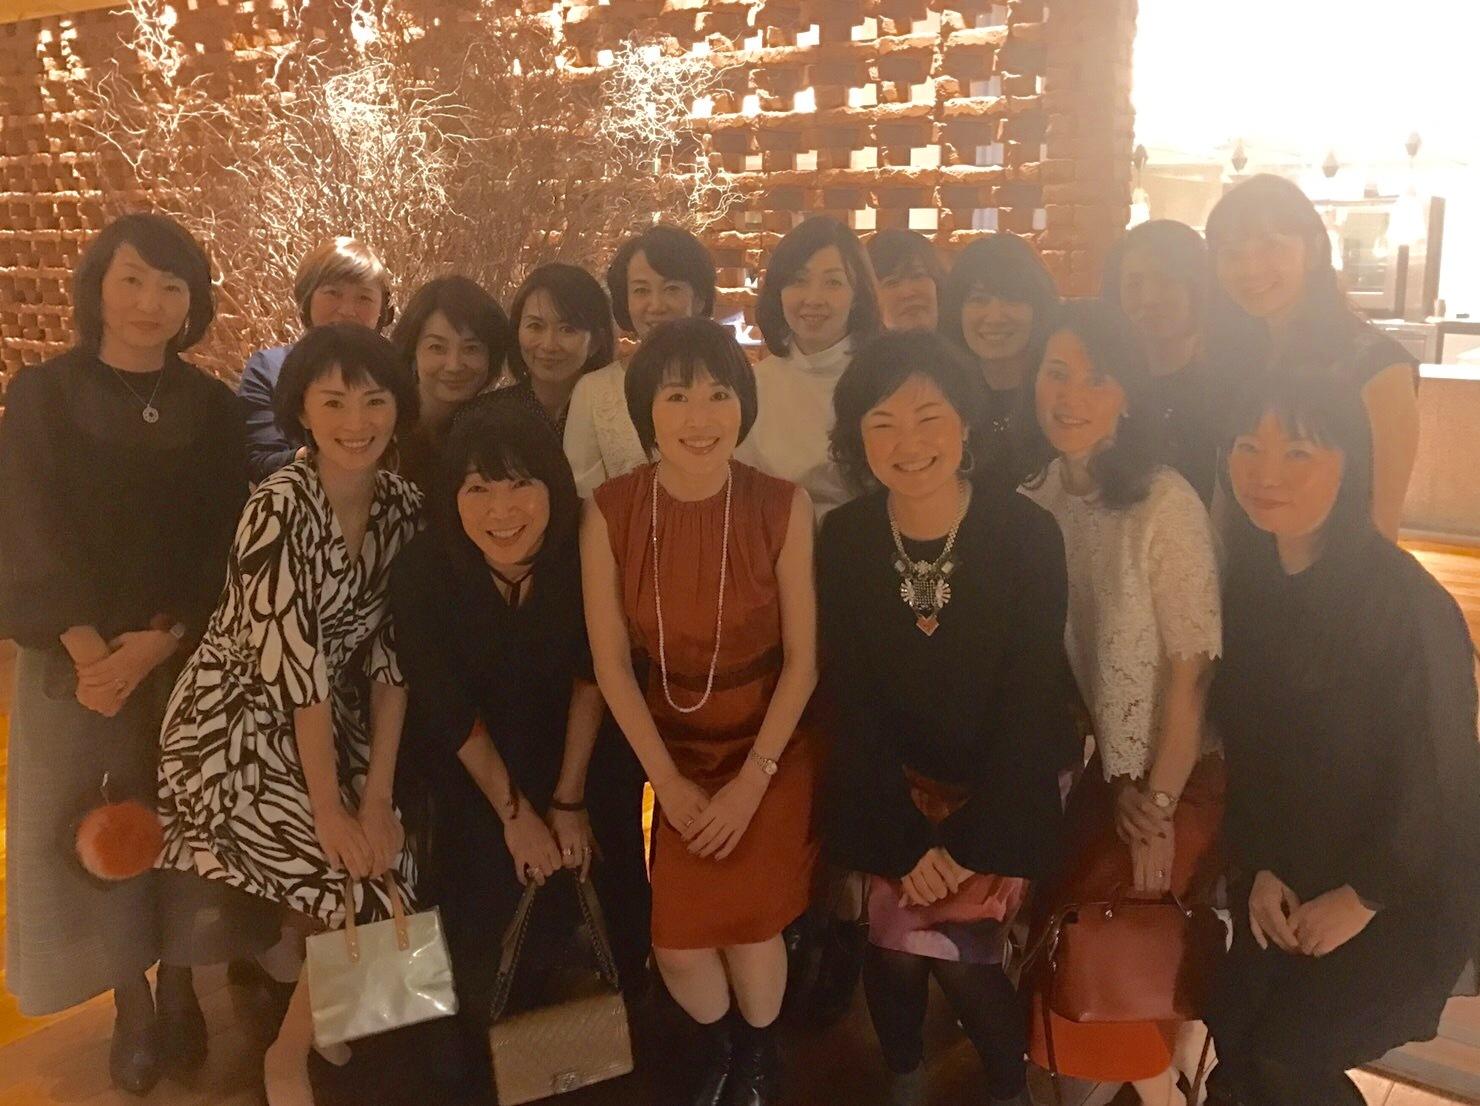 ASTALIFT with Marisol & eclat「大人女子の美容遠足」_1_4-3